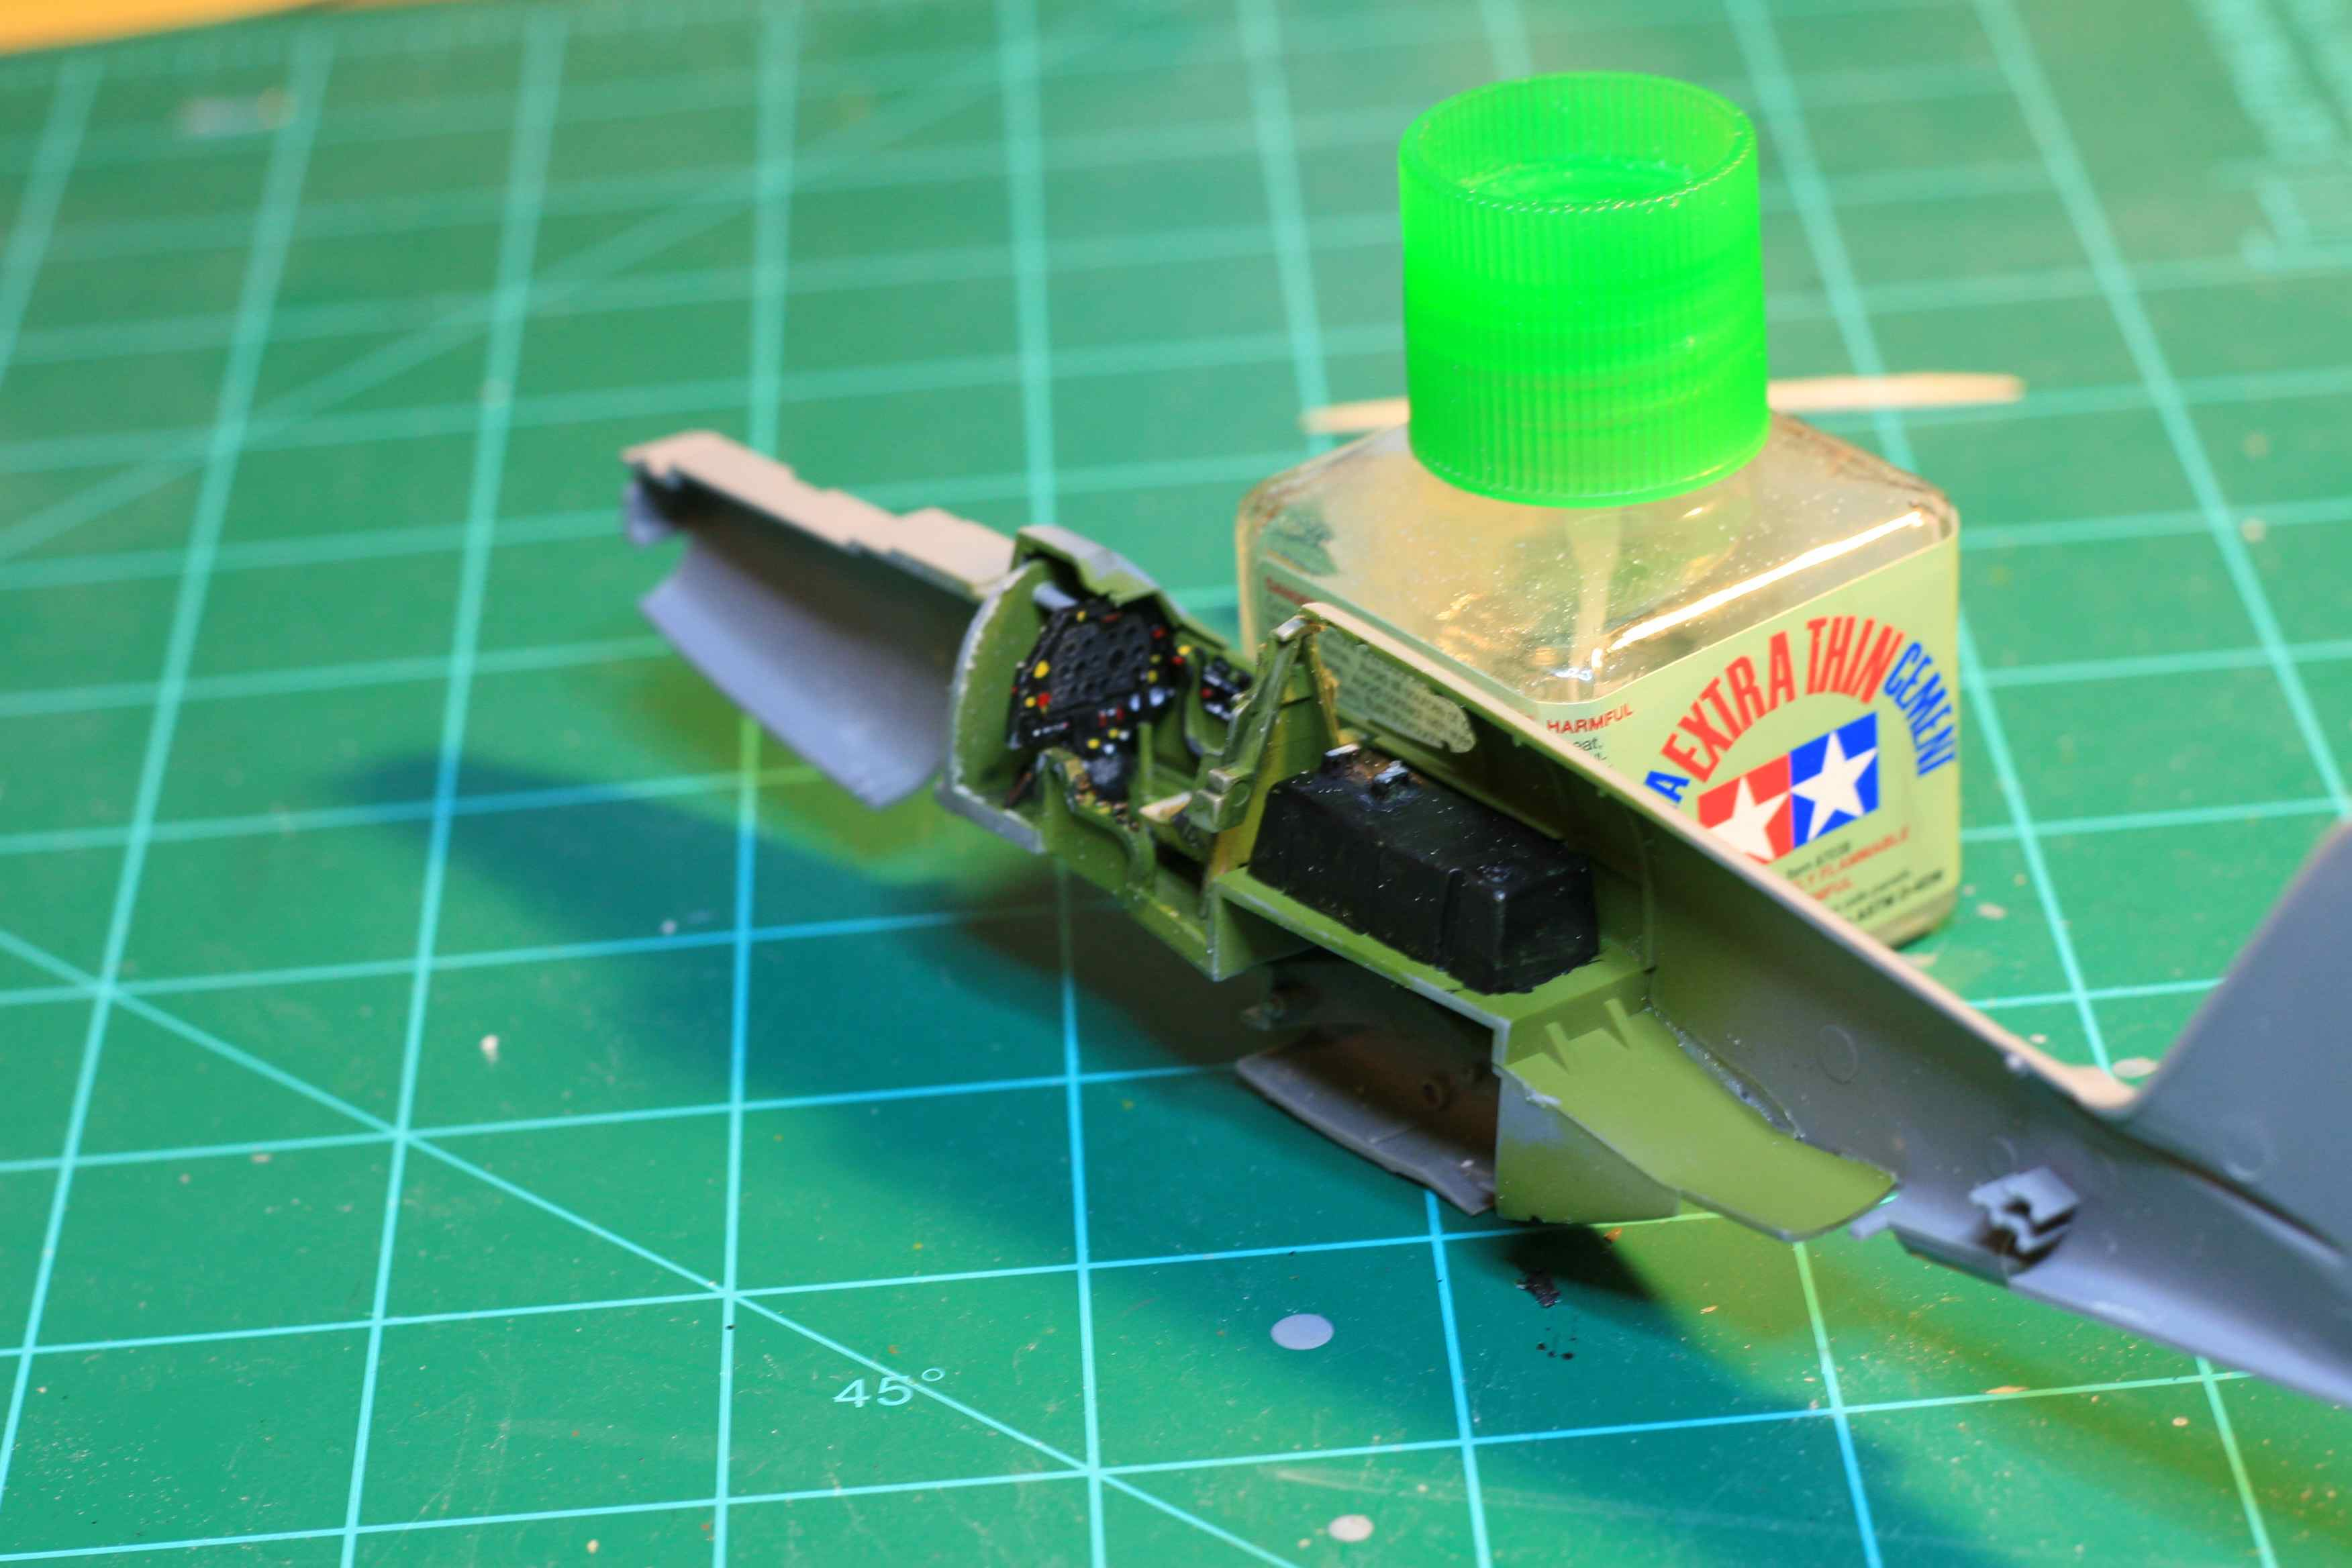 Tamiya 1/48 P-51B Build-fusergtside2_small.jpg